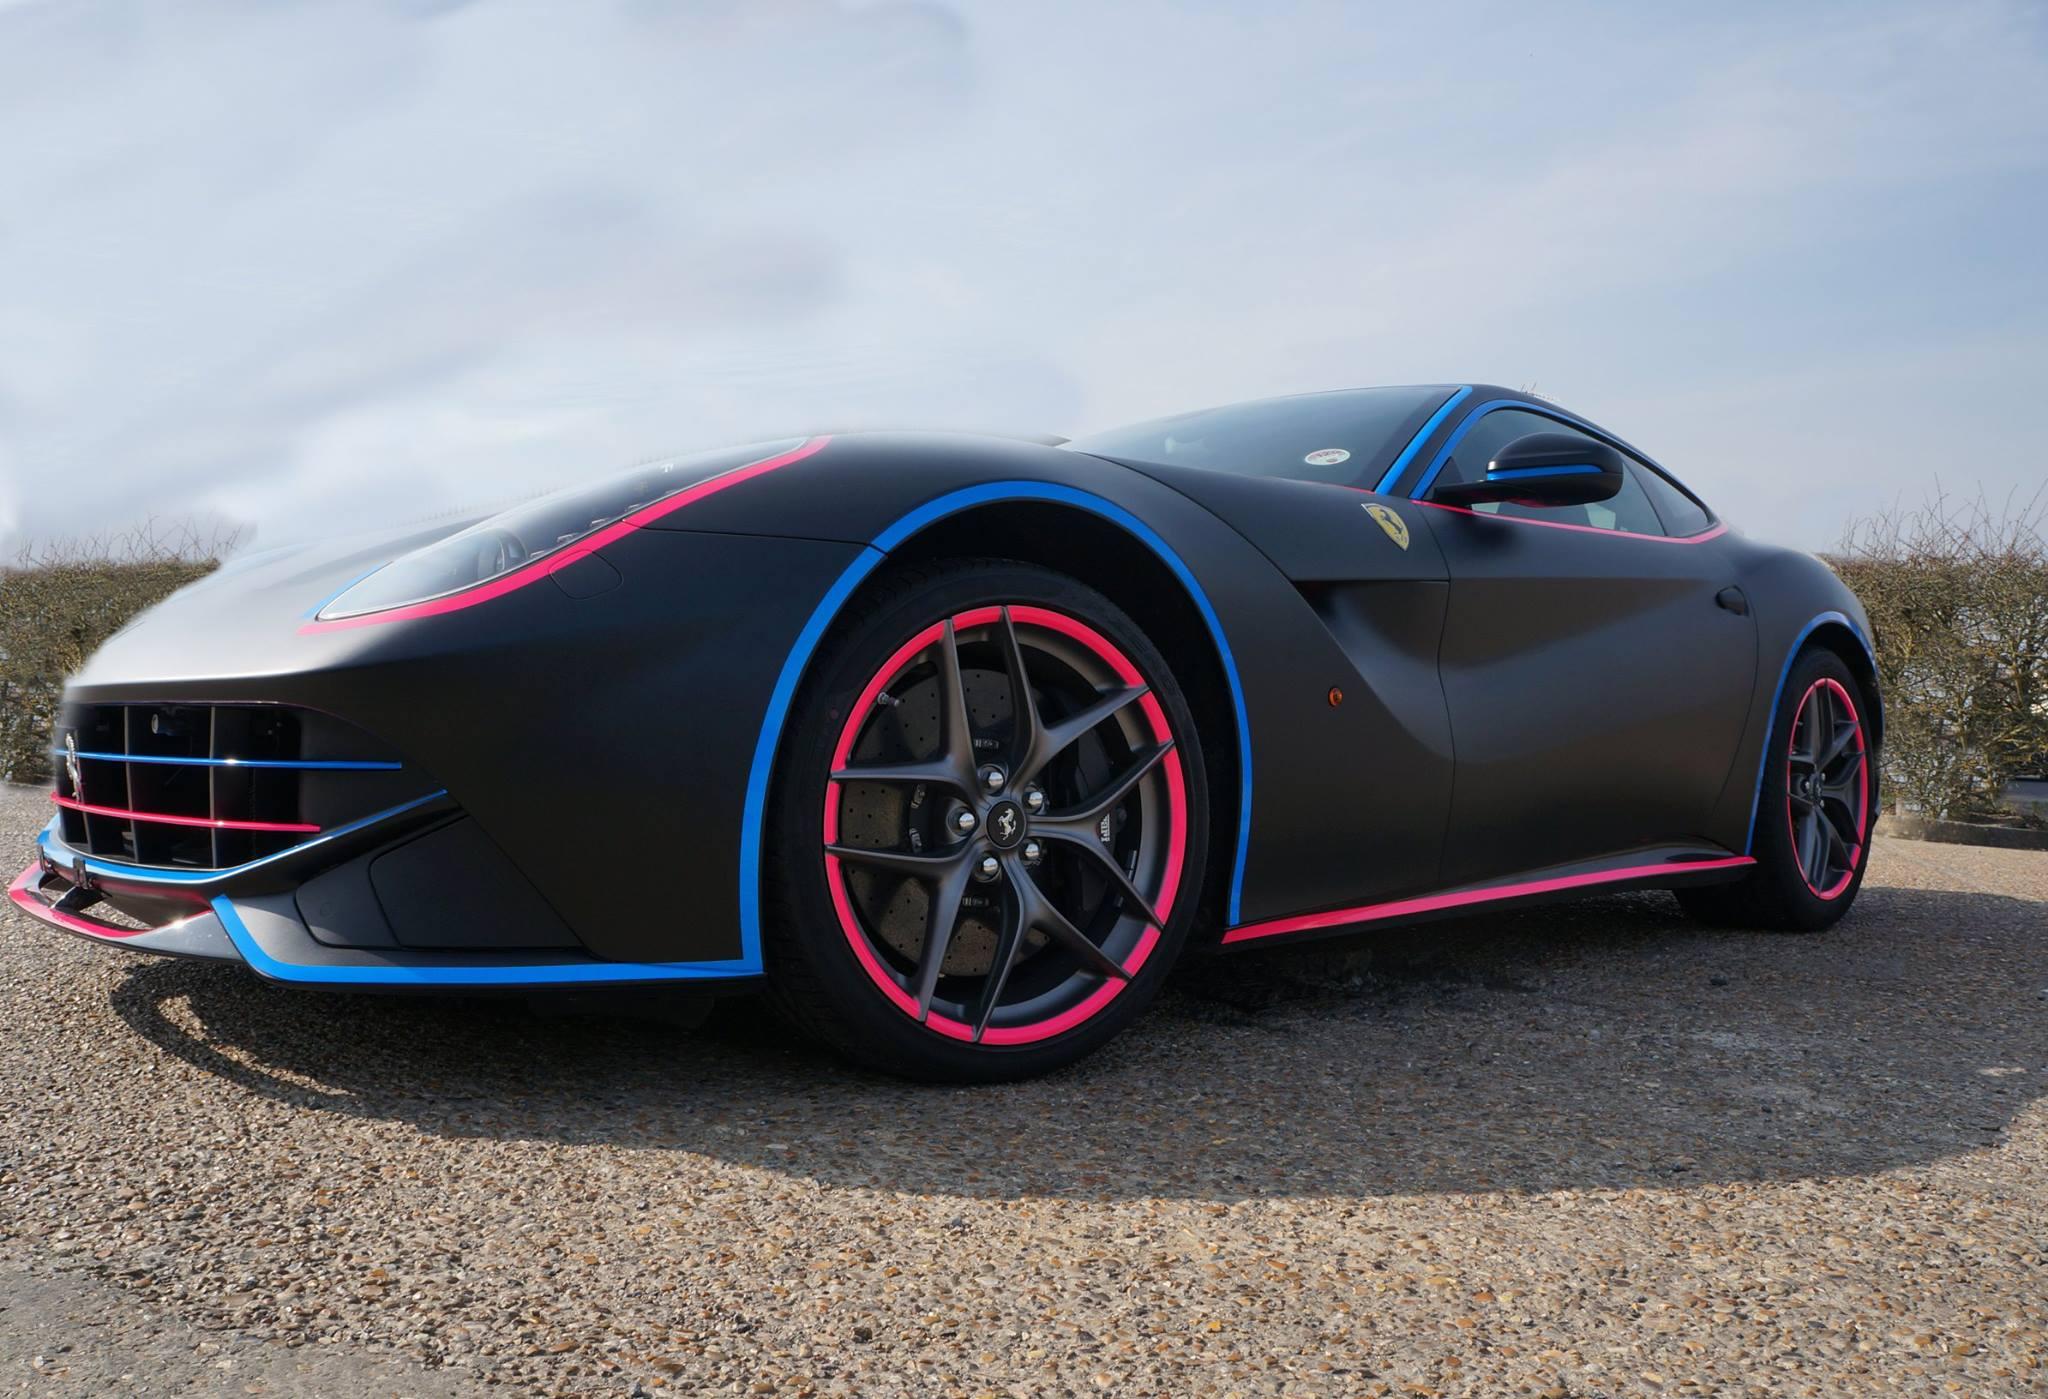 2014 Gumball 3000 Rally Wrap Ferrari F12 Gets Miami Vice Look  autoevolution